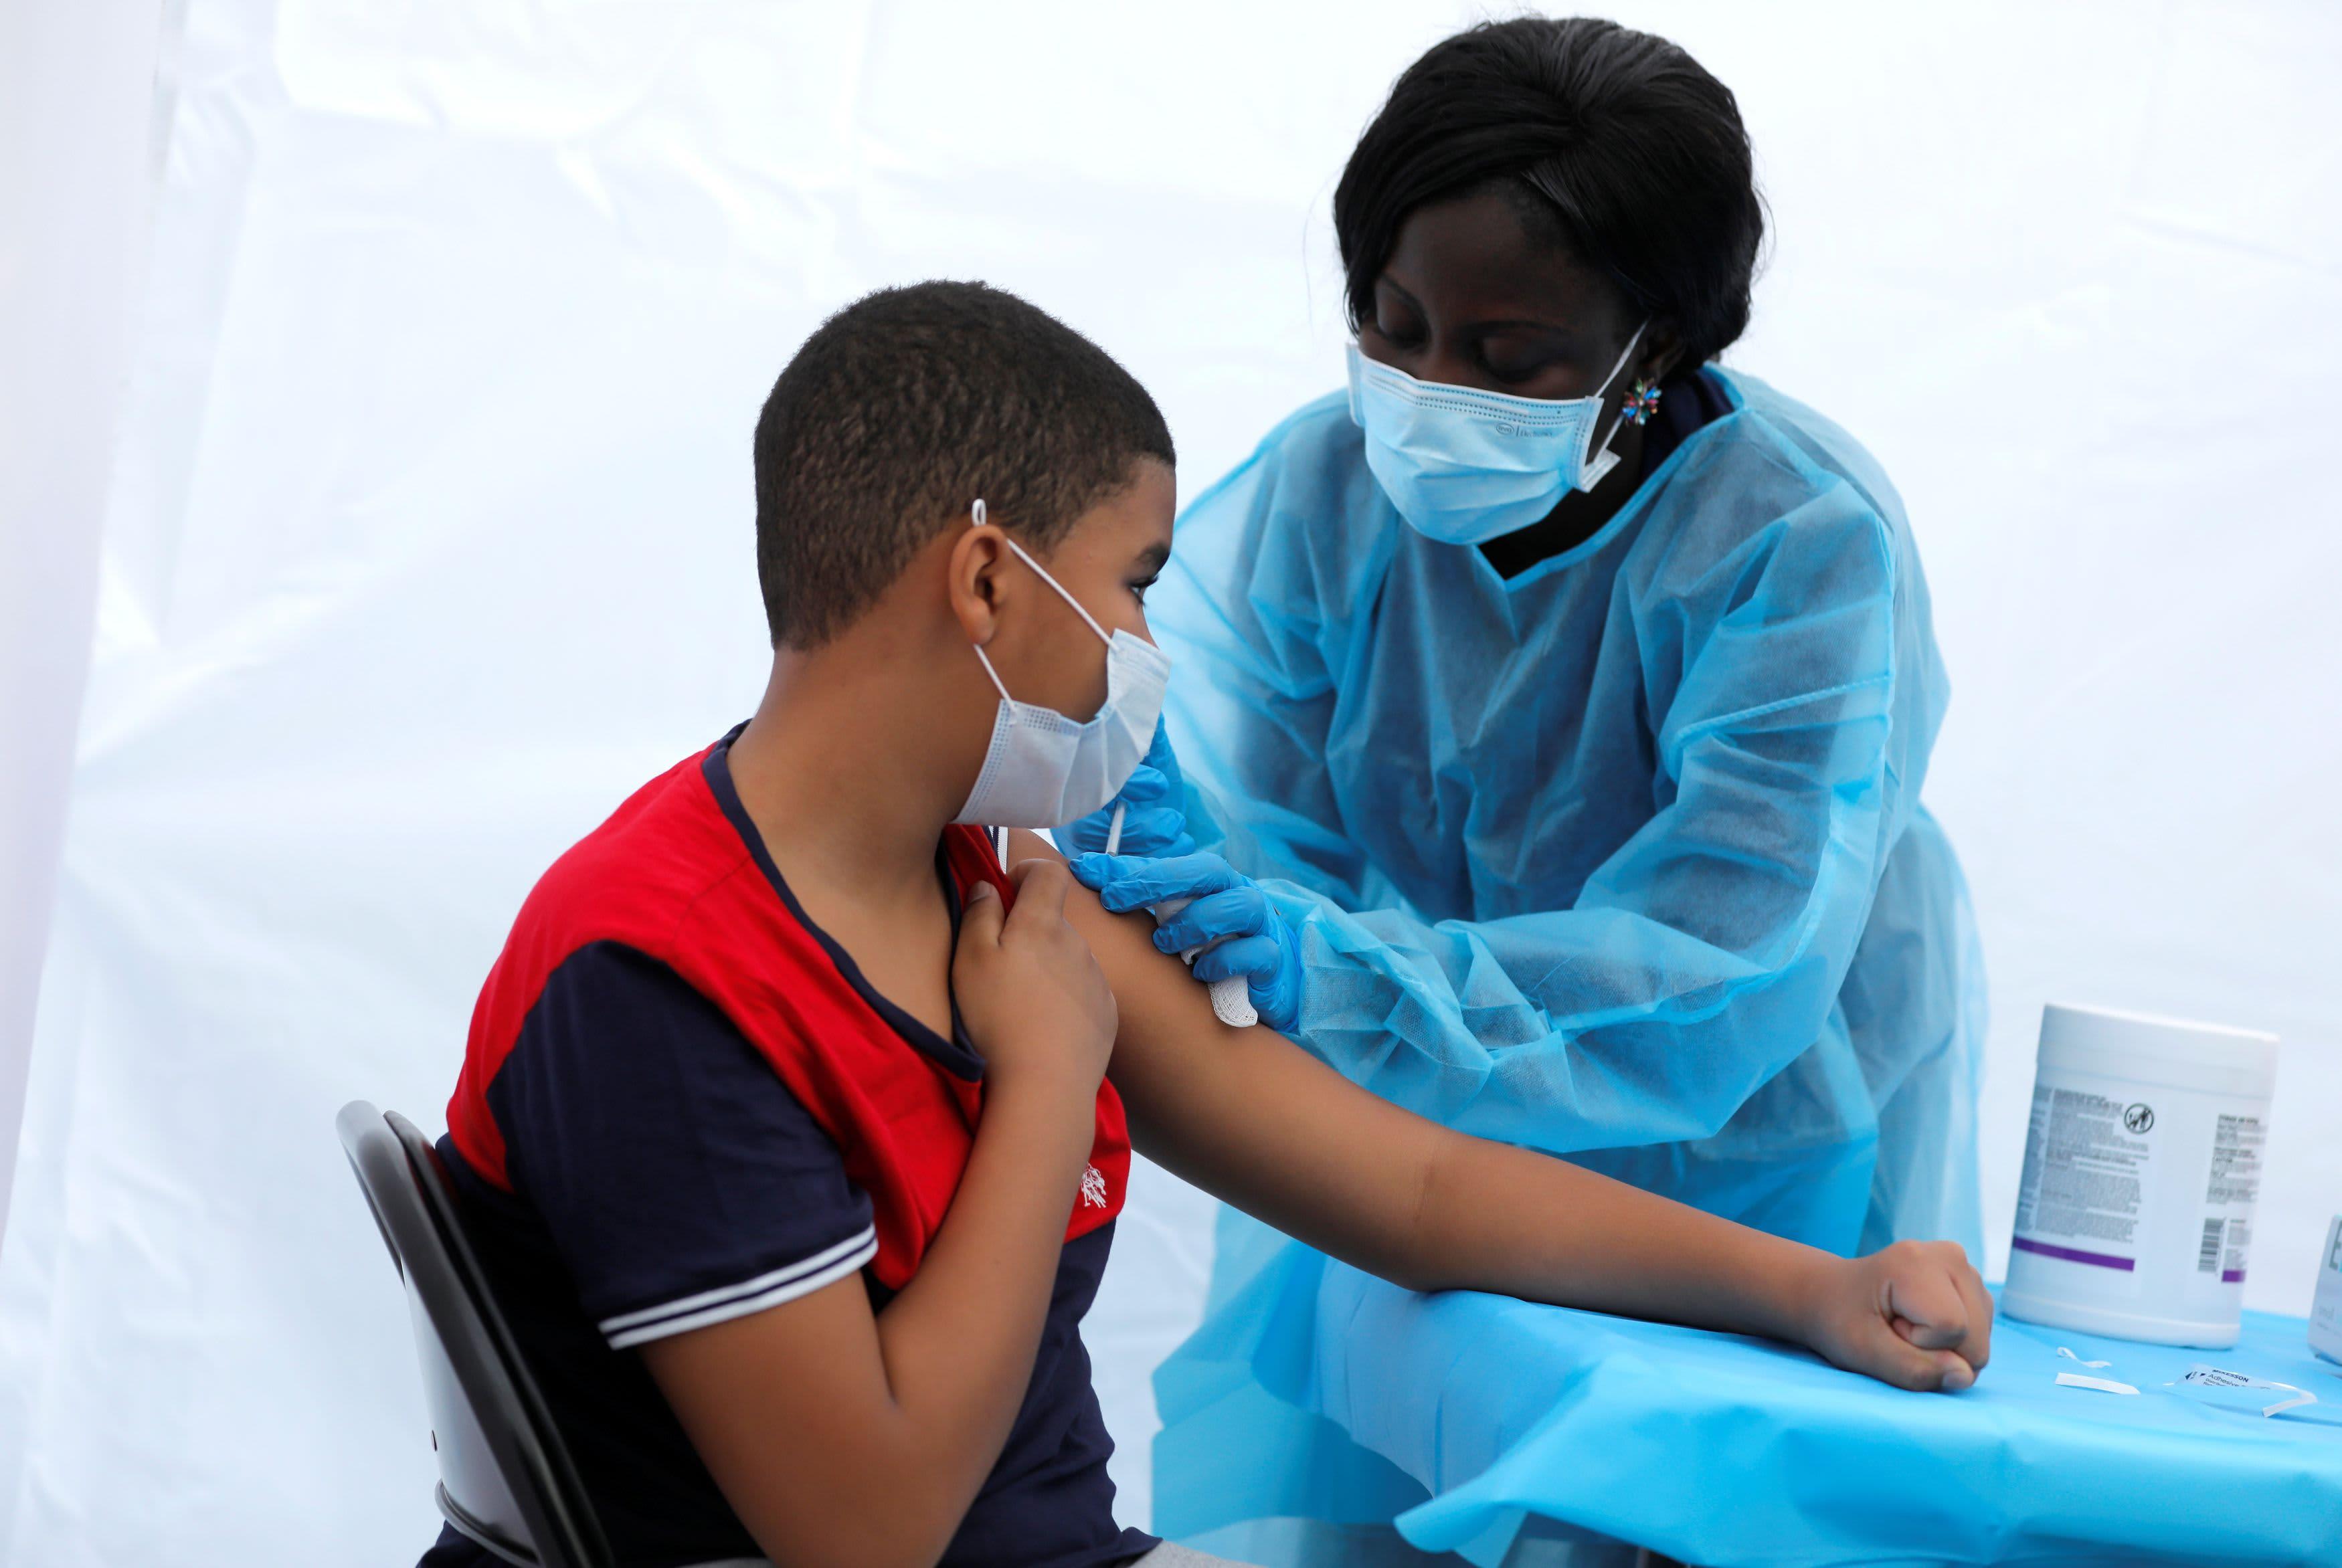 106892528-16228268132021-06-04t171107z_1393905116_rc2qtn902945_rtrmadp_0_health-coronavirus-vaccines.jpeg?v=1622826883